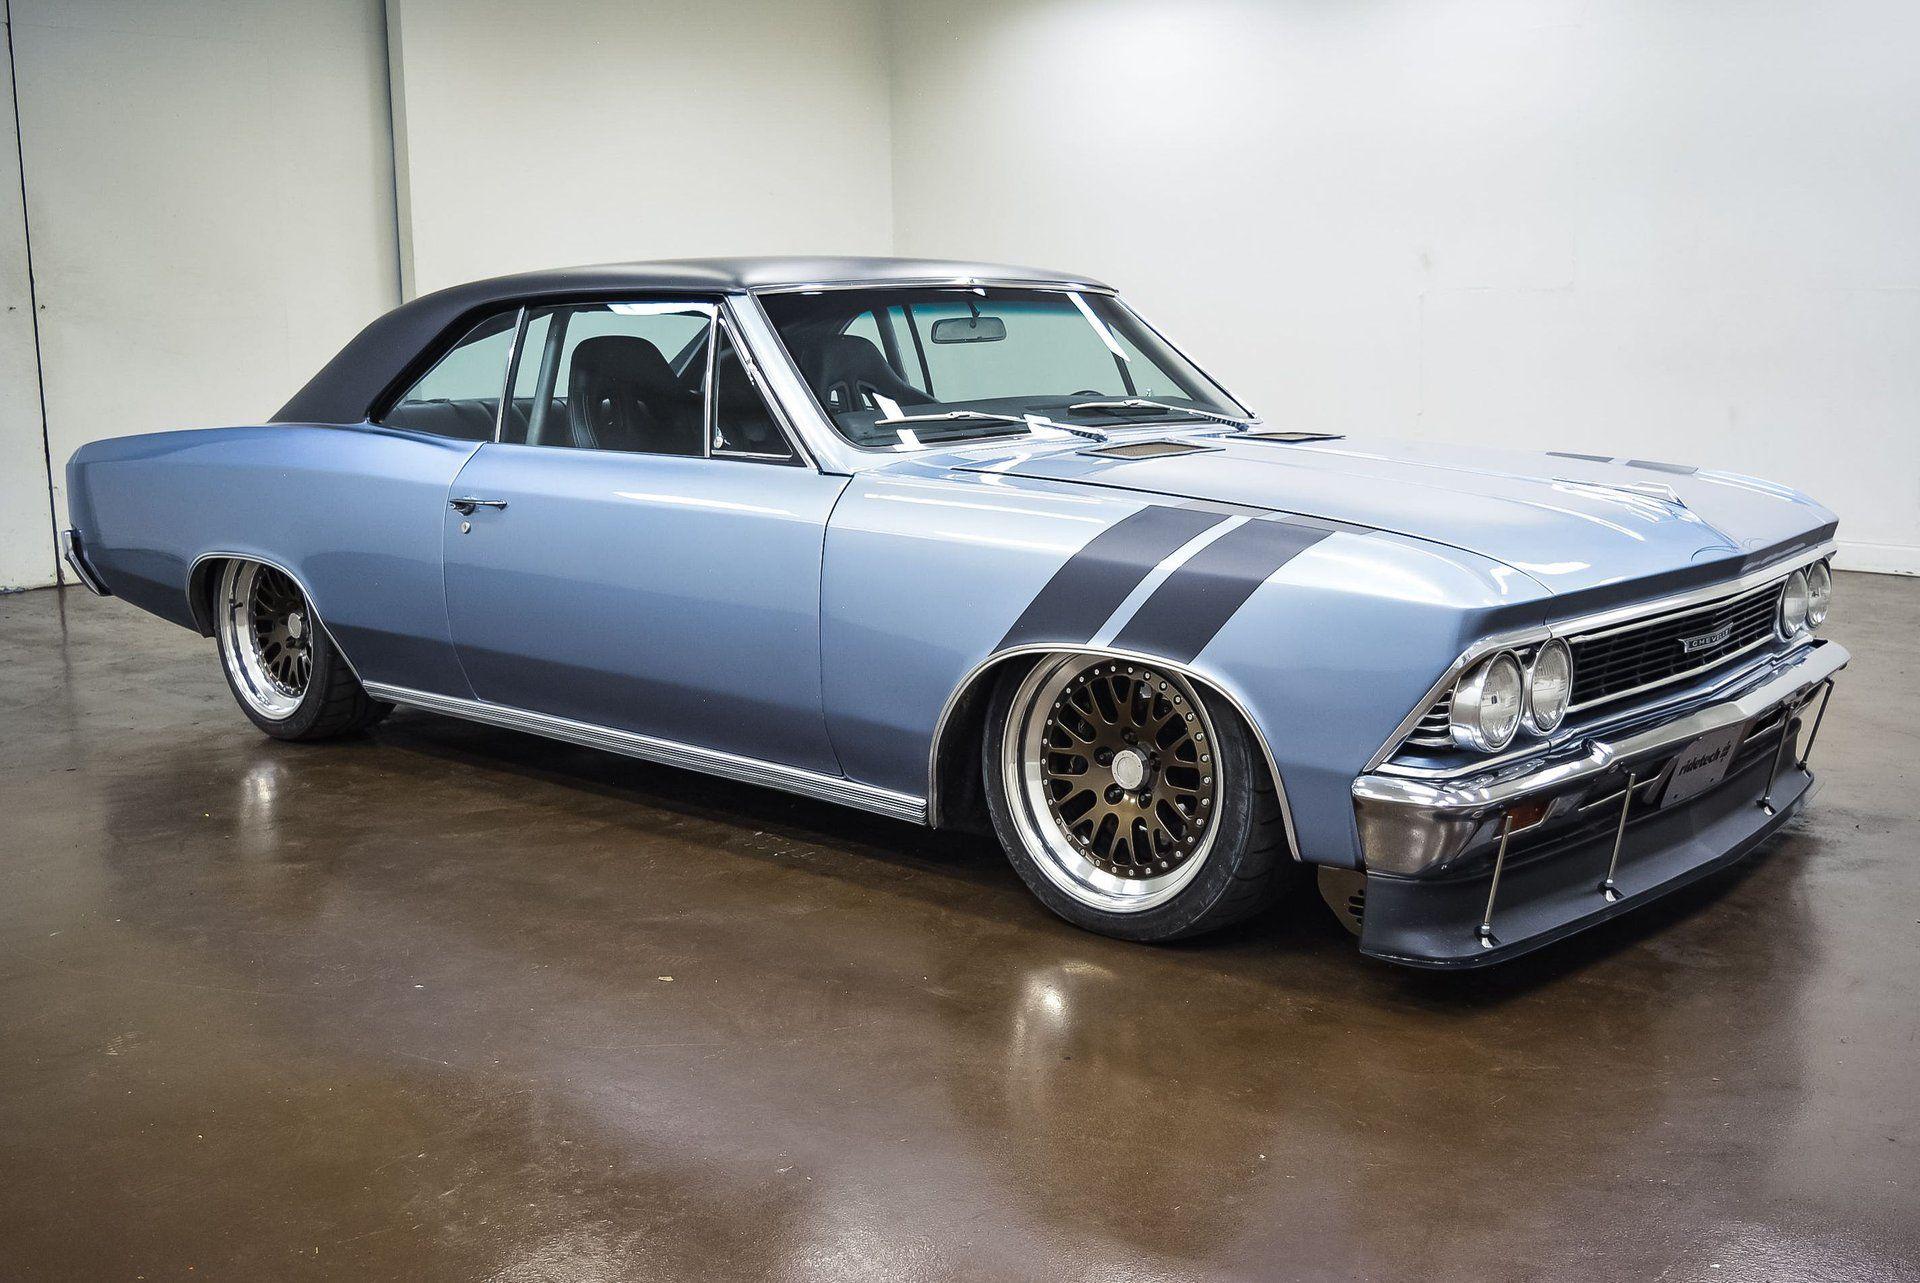 "<img src=""1966-malibu.jpeg"" alt=""A 1966 Chevrolet Chevelle Malibu Pro-Touring"">"